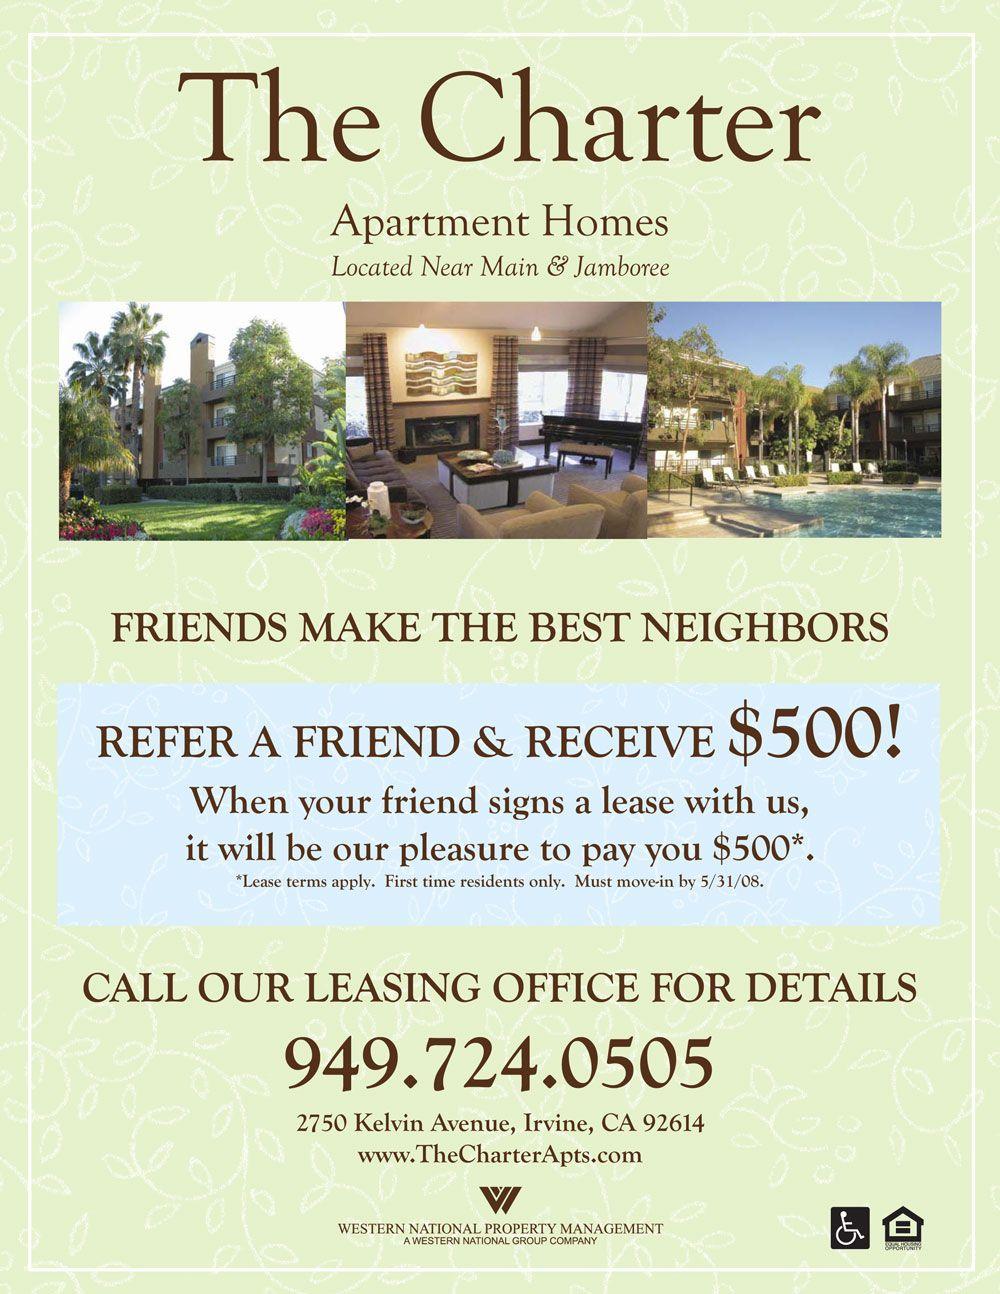 Refer A Friend Apartment Flyer Apartment Marketing Marketing